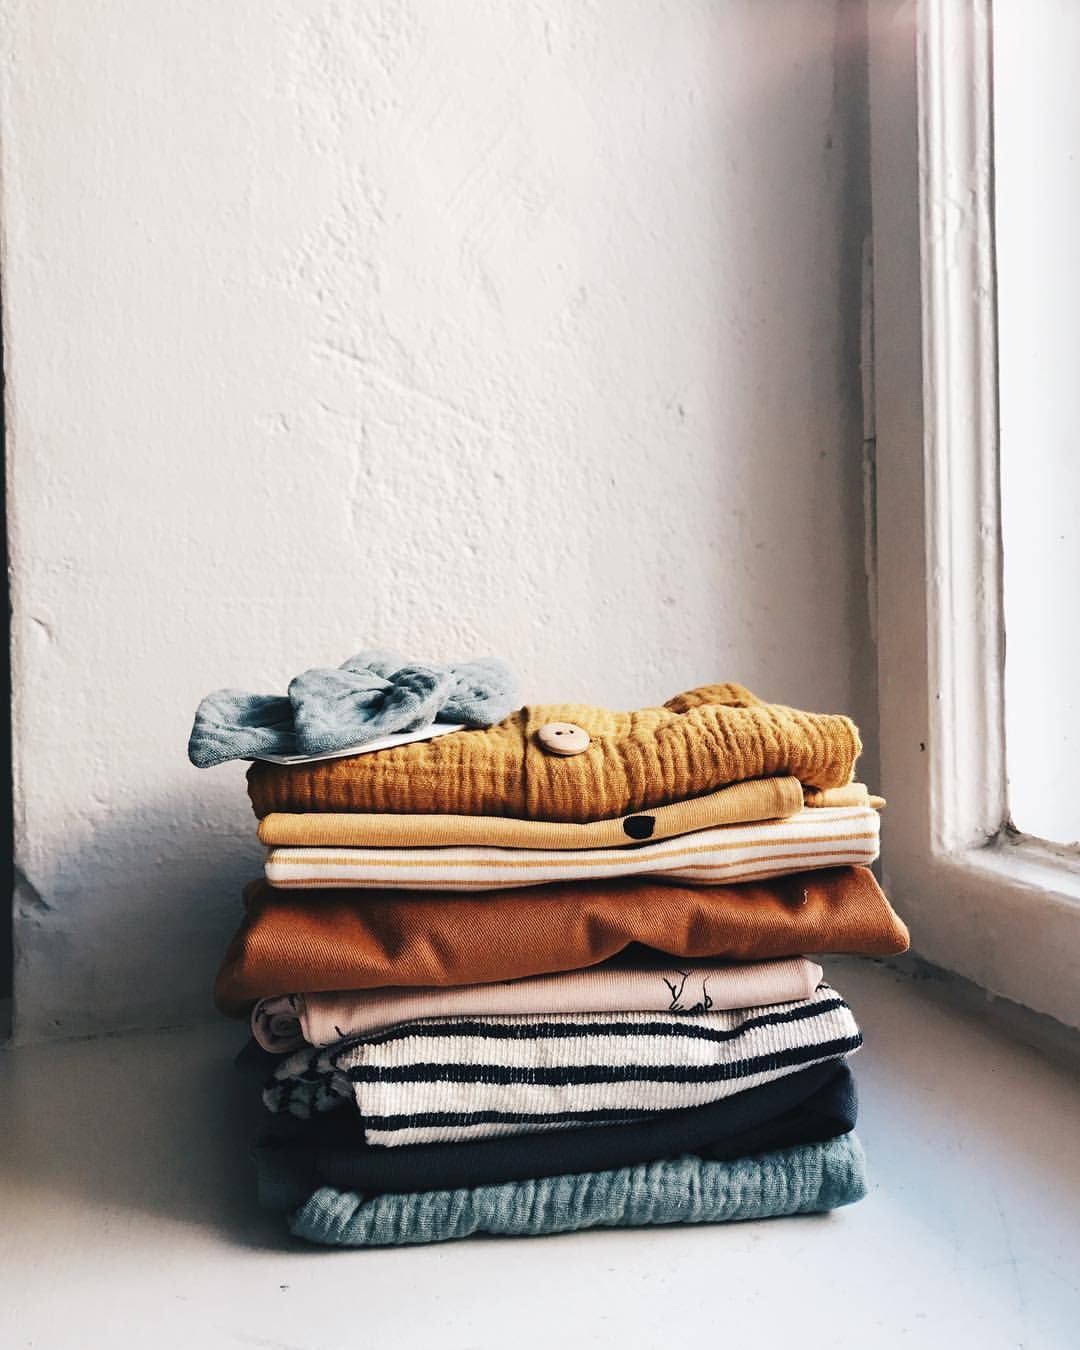 My kind of pile 🌿 monkind bonhomie ss18 organic